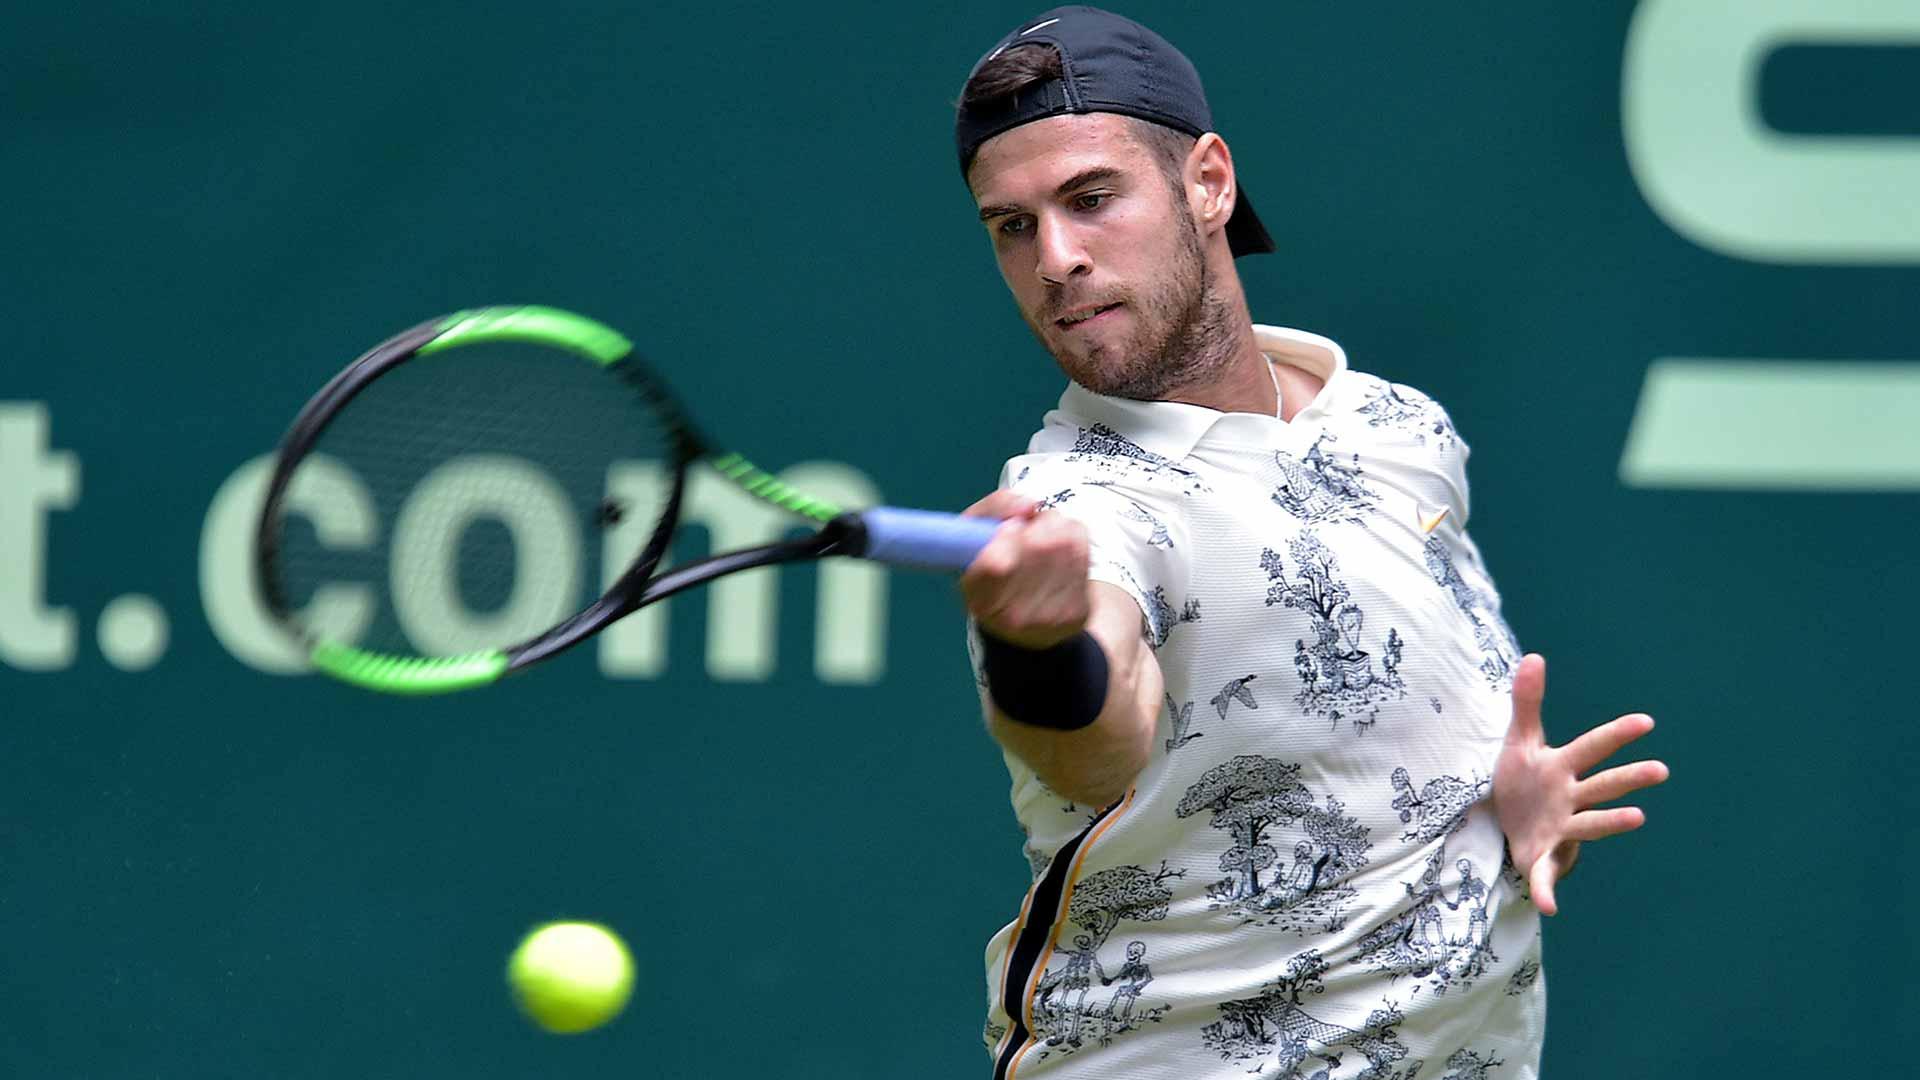 Karen Khachanov beats Miomir Kecmanovic at the NOVENTI OPEN in Halle | ATP Tour | Tennis